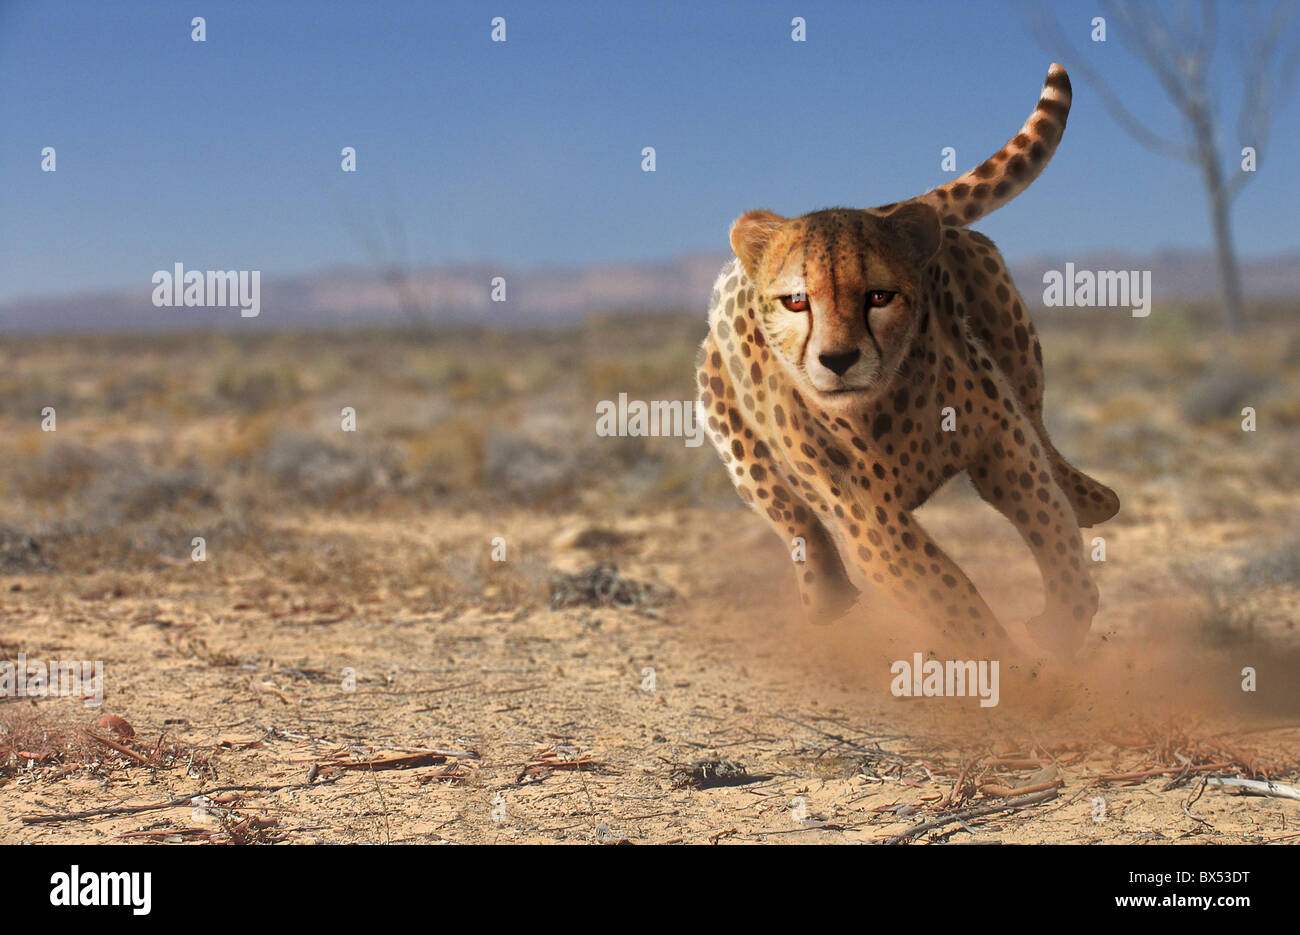 Cheetah tournant, artwork Photo Stock